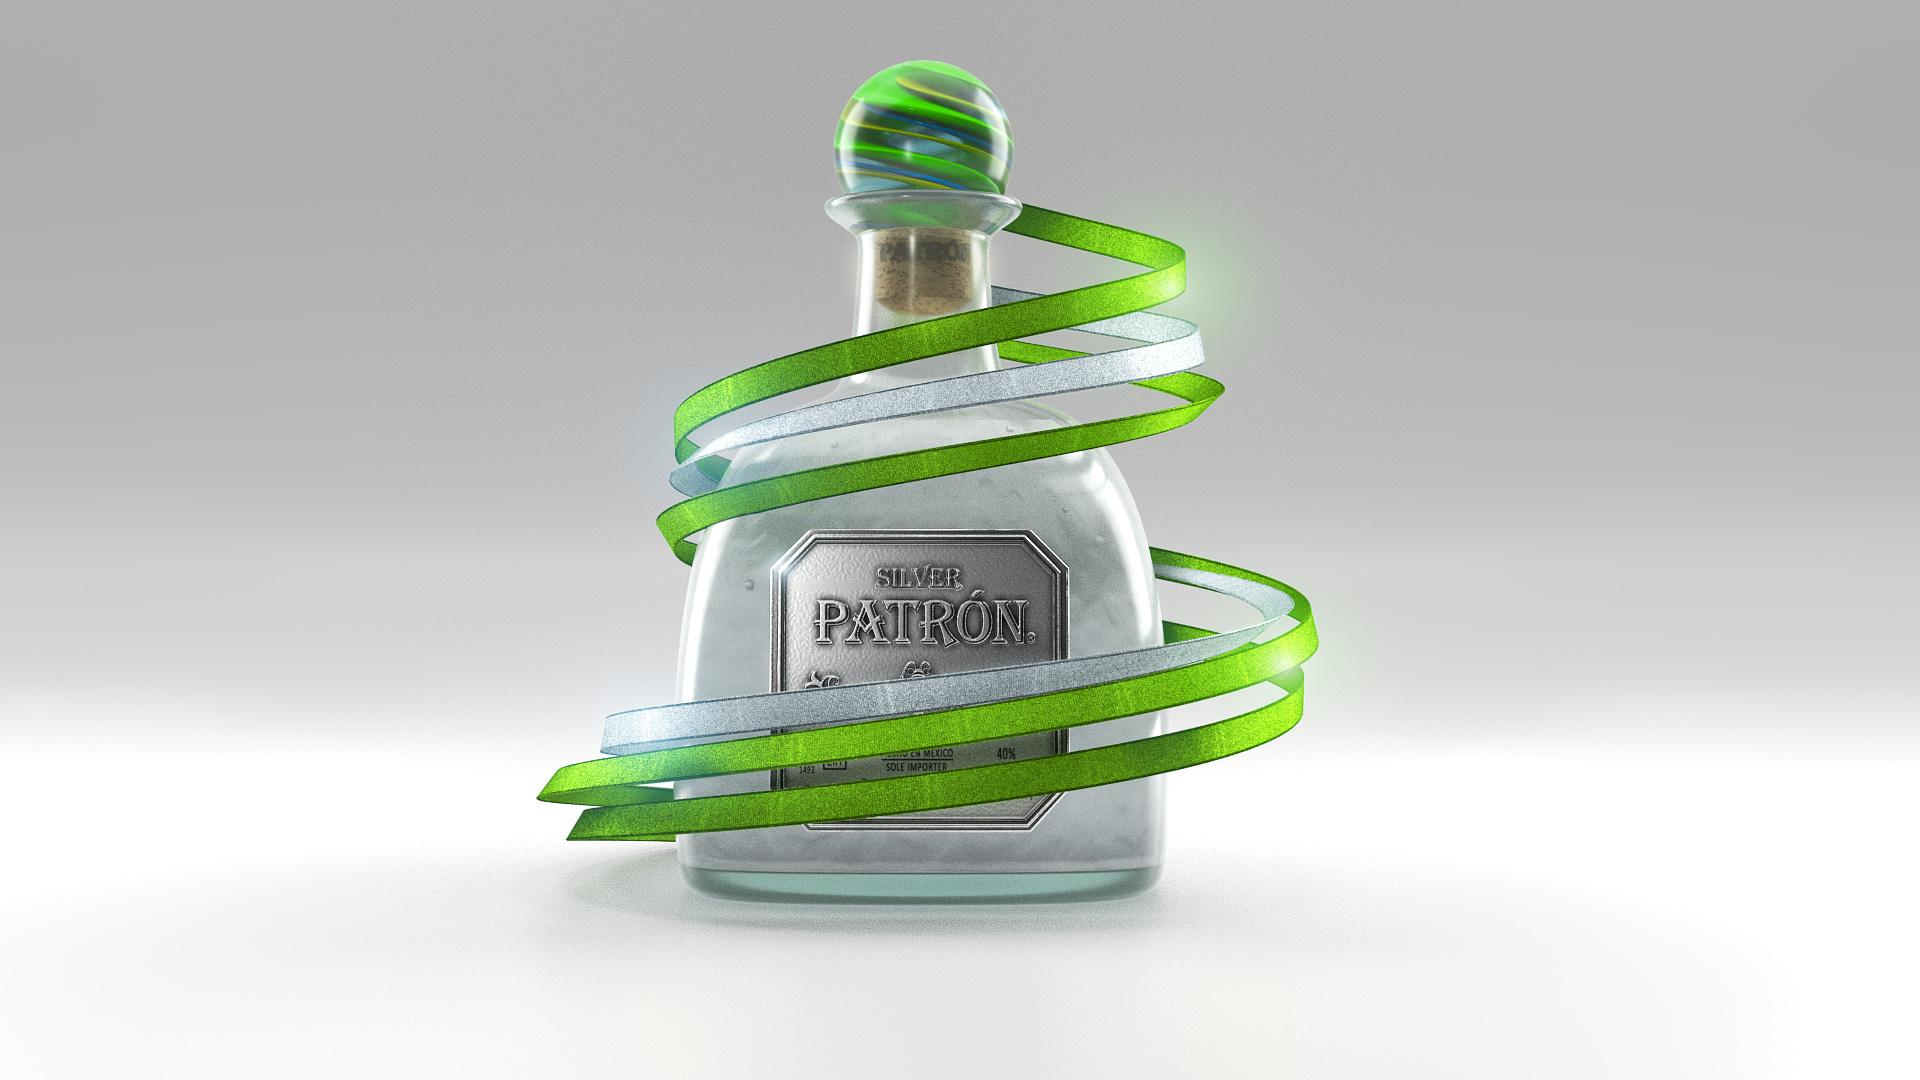 Patron_Bottle_Ribbons.jpg